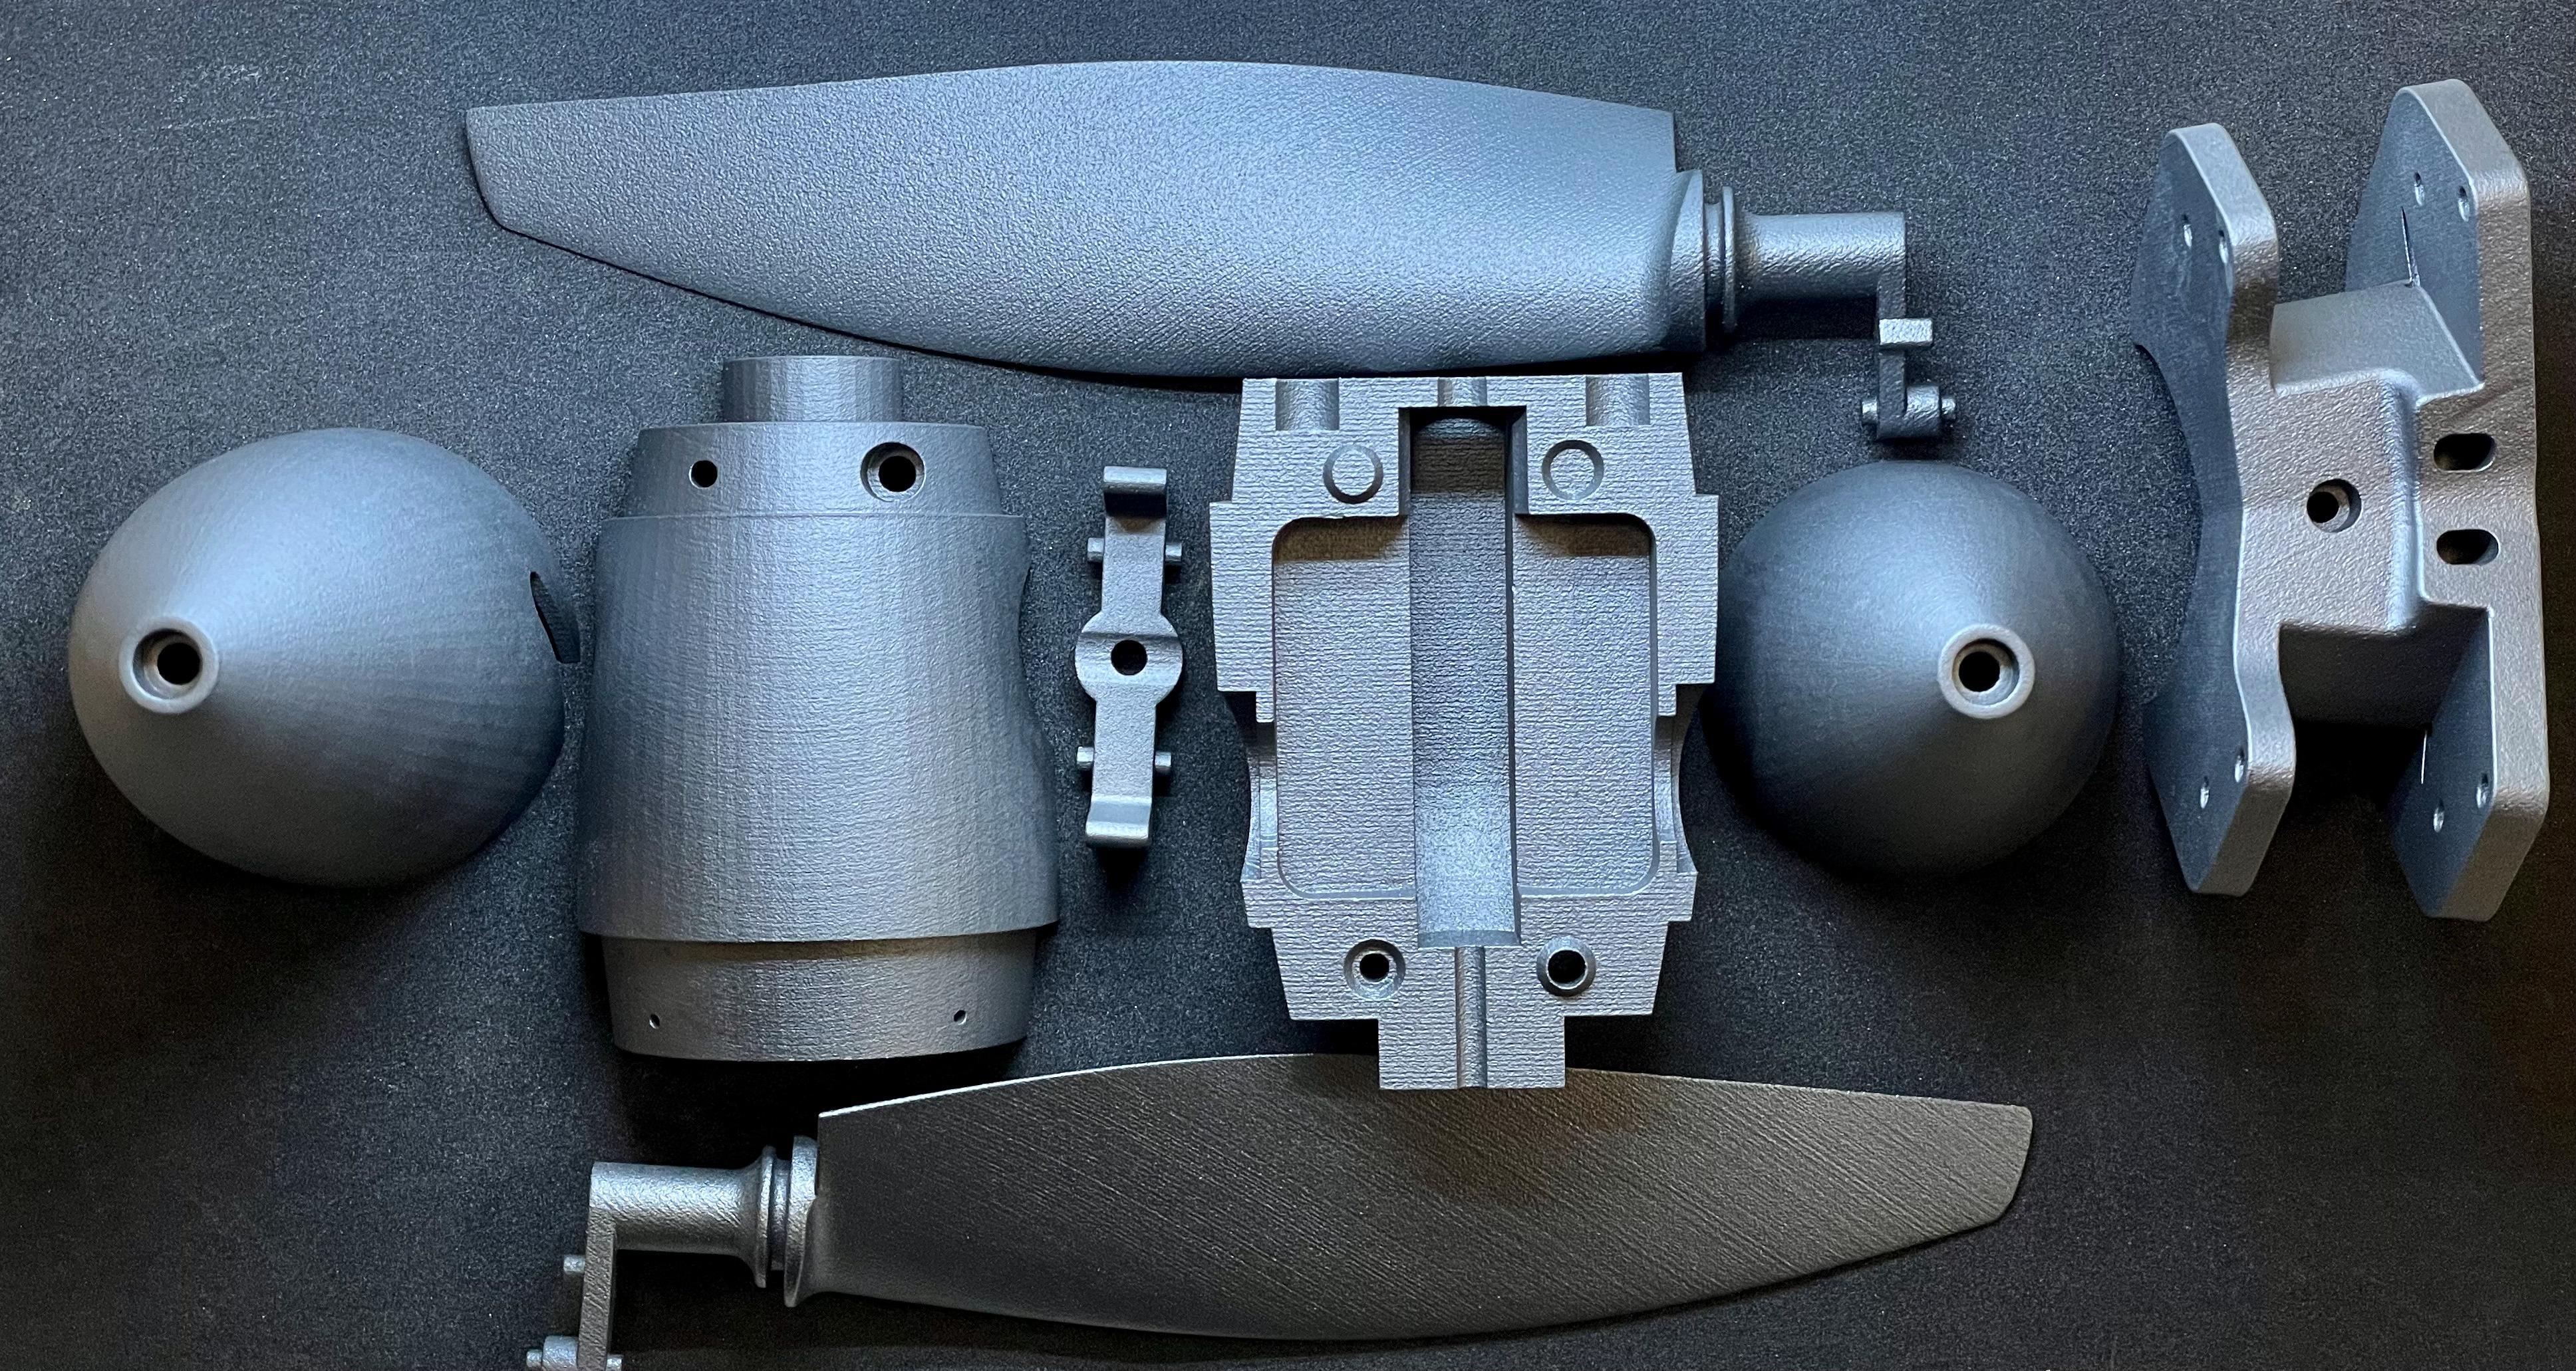 3D printed end parts